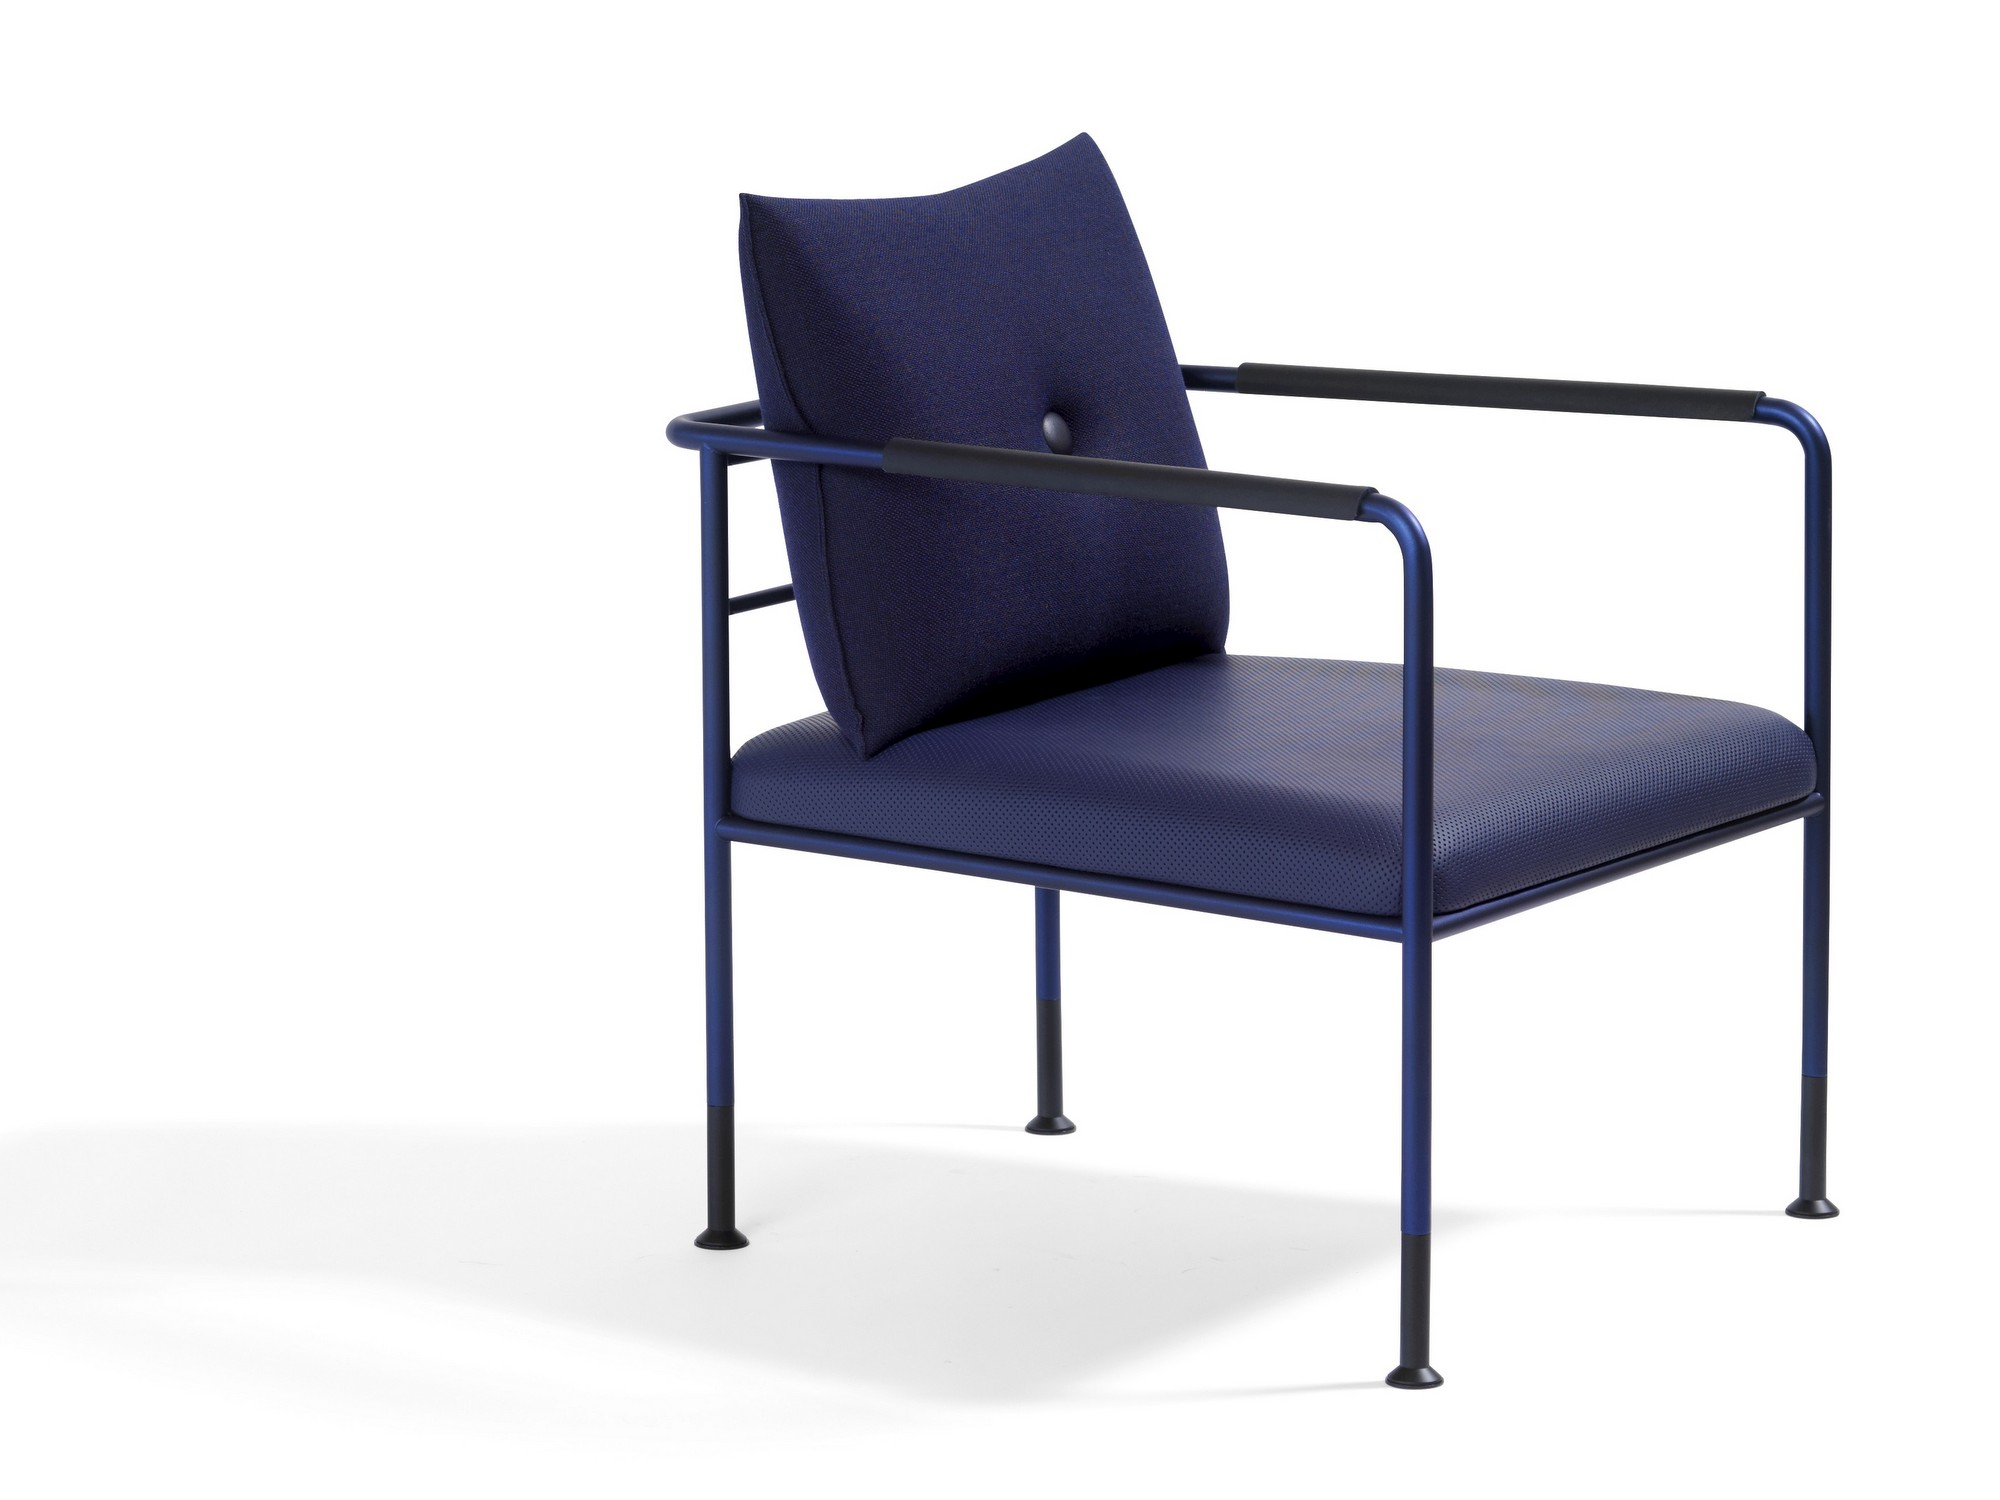 Morris JR Armchair by Johan Lindau for Blå Station